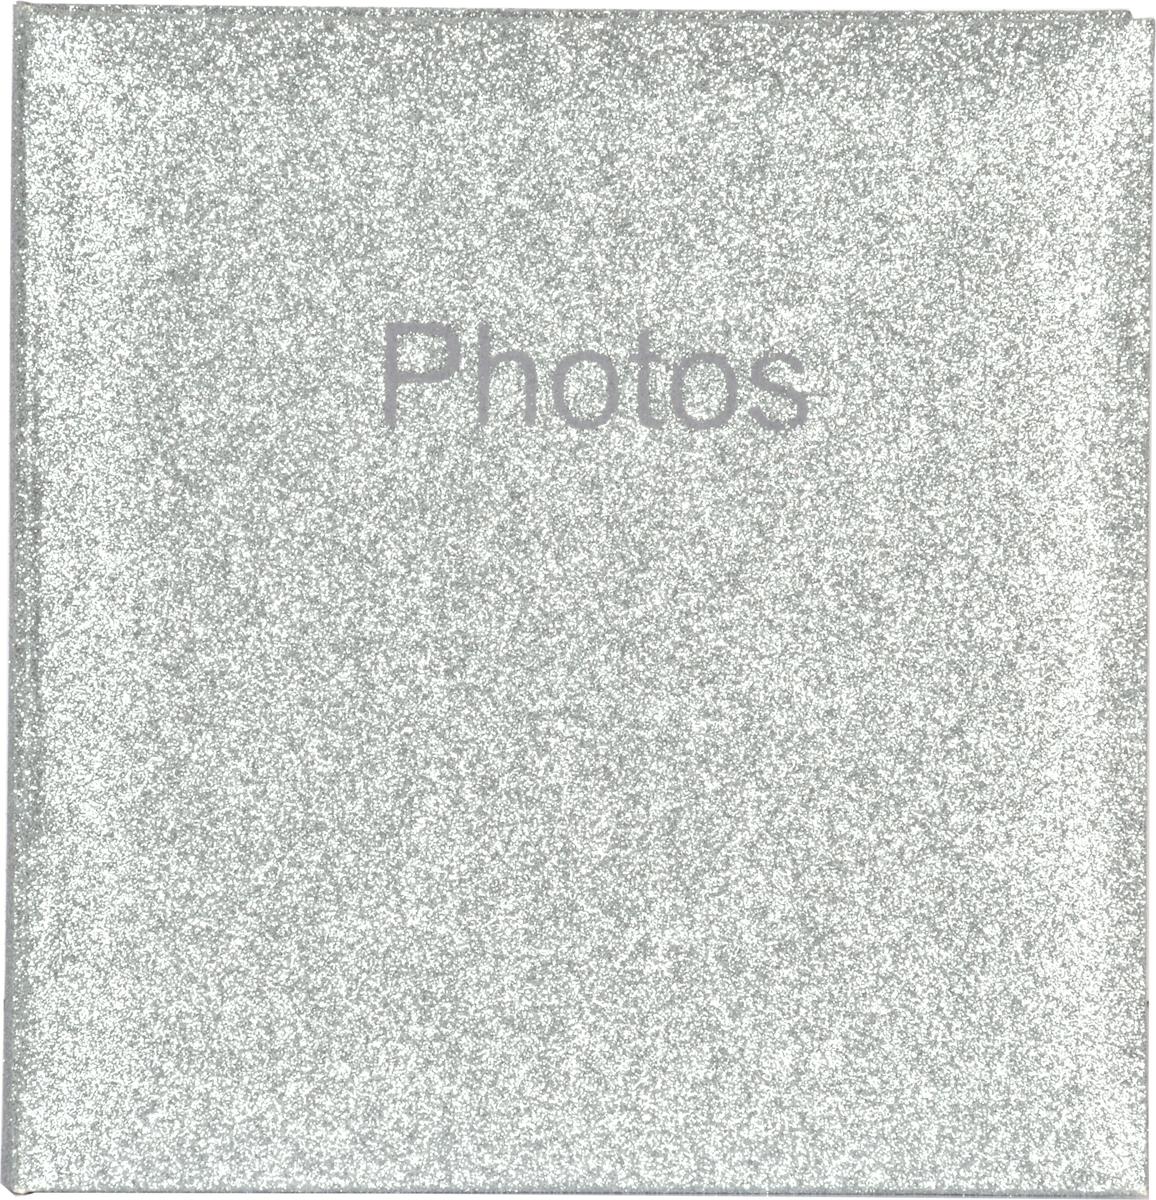 Фотоальбом Innova Glitter silver, 200 фотографий, 10 х 15 смQ4108449M